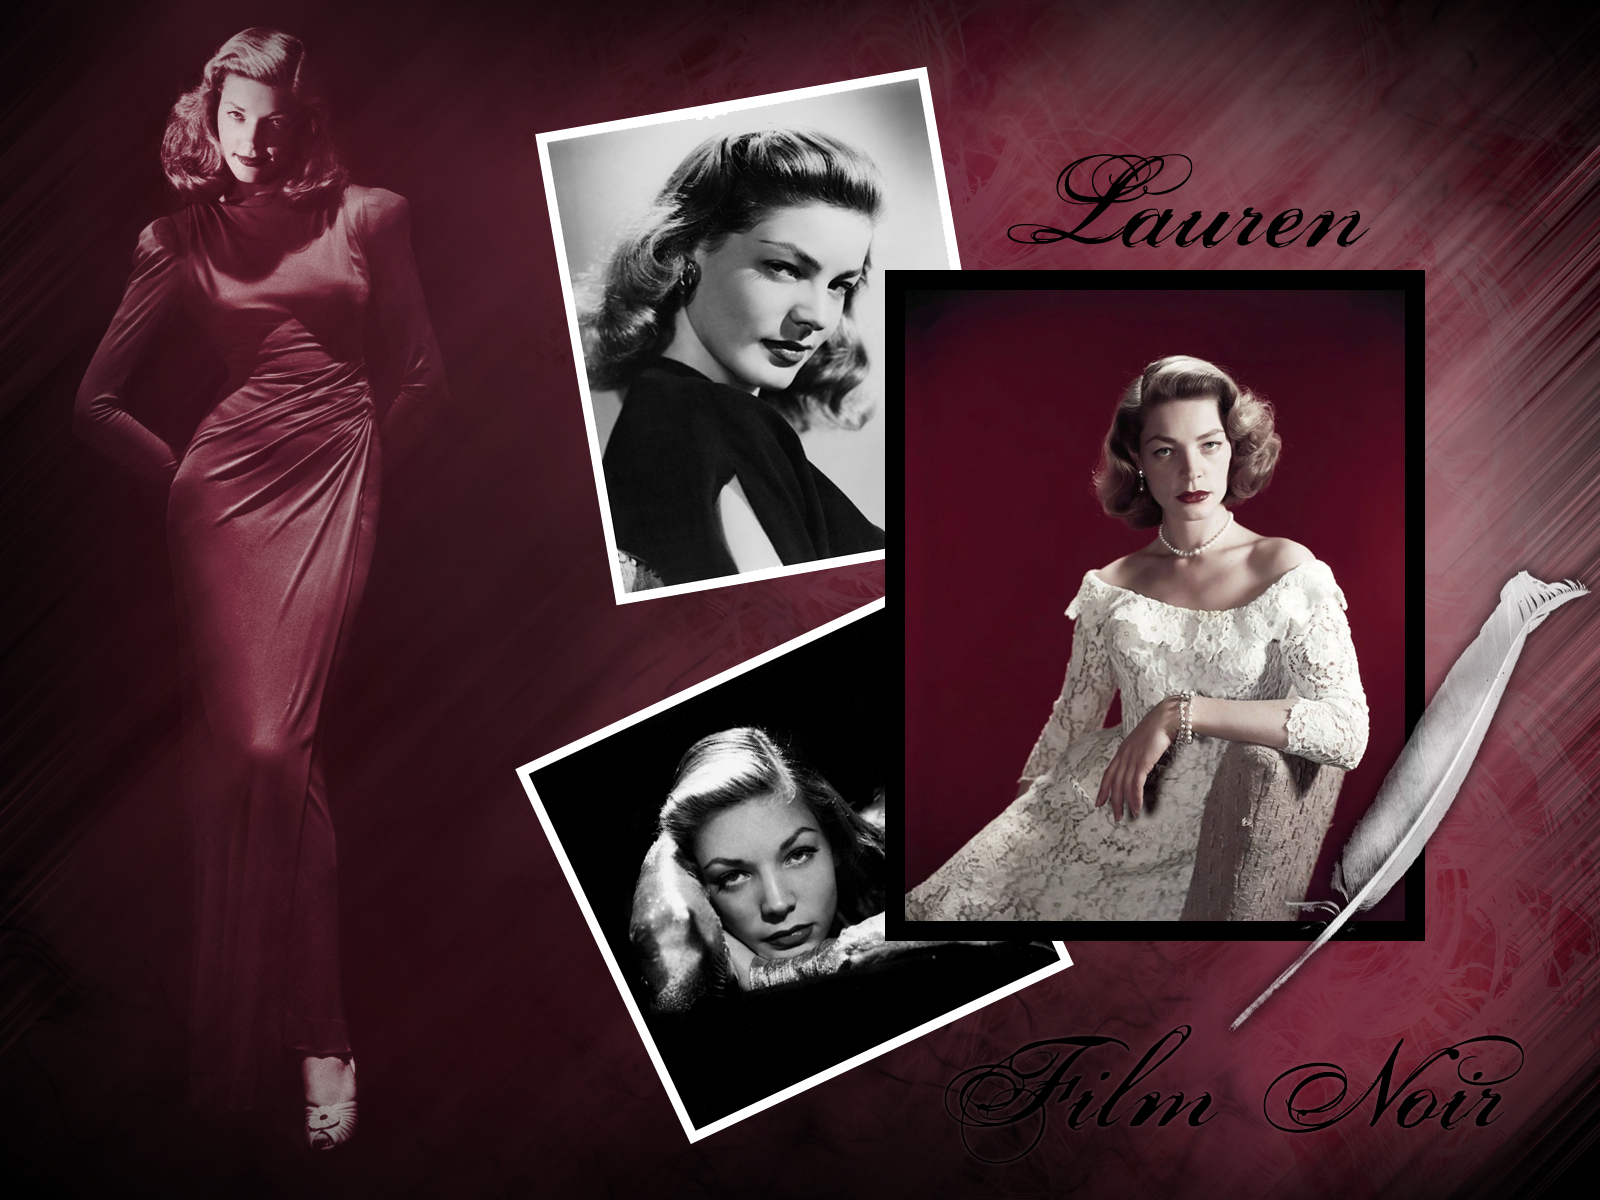 Lauren Bacall - Classic Movies Wallpaper (6531835) - Fanpop Lauren Bacall Movies